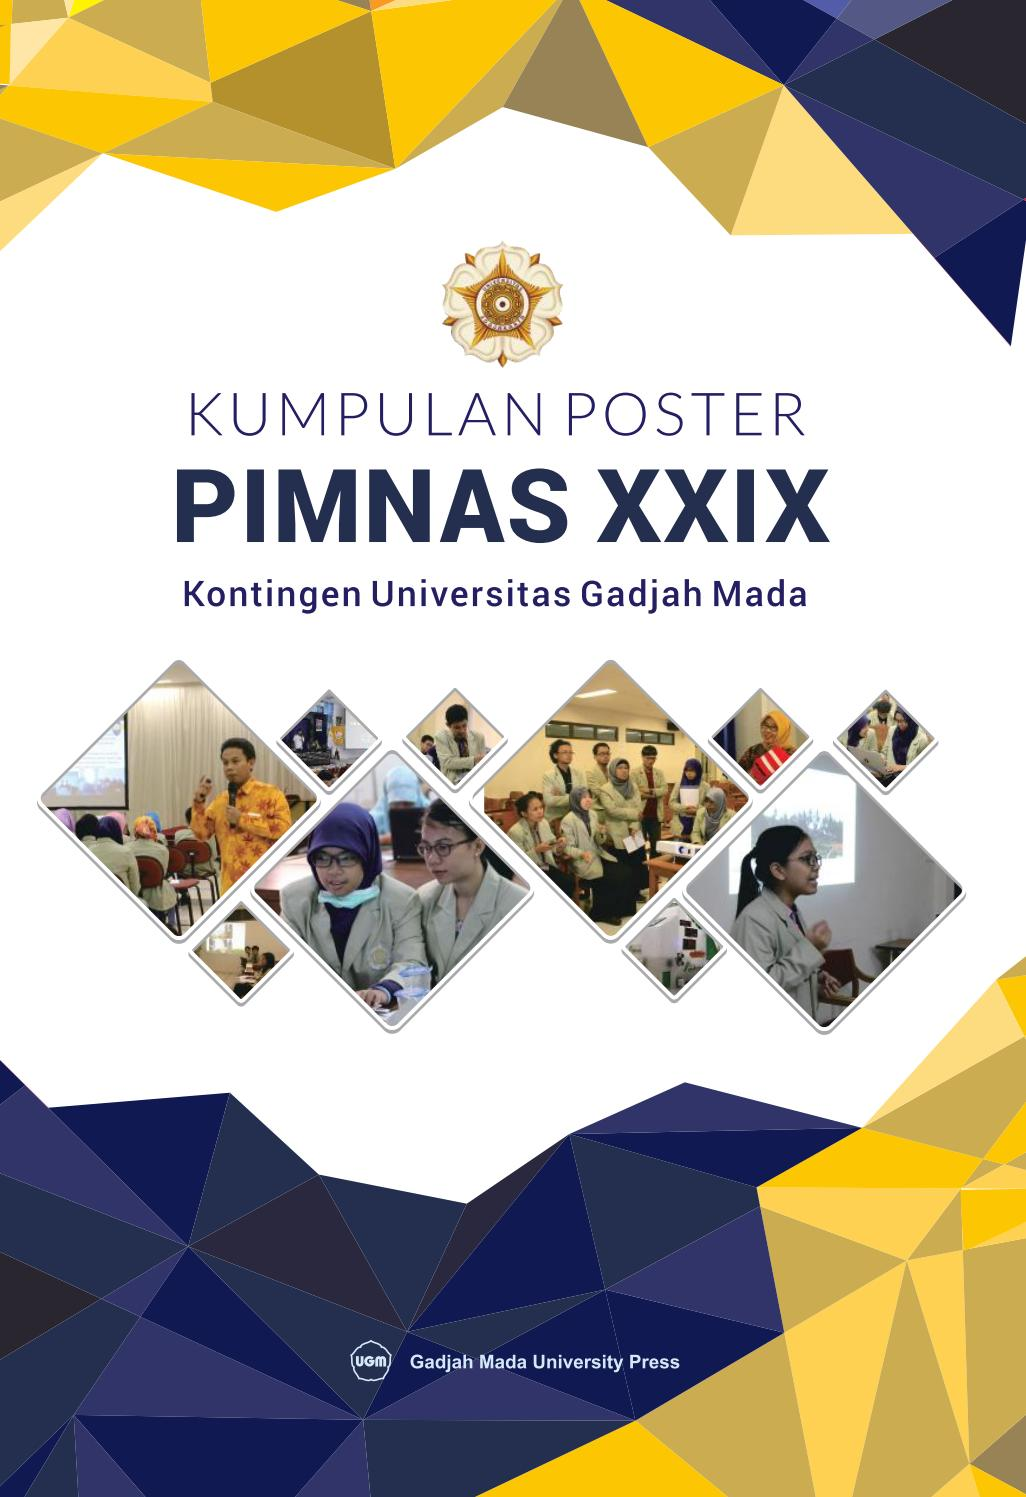 Buku Kumpulan Poster Kontingen Pimnas Xxix Ugm By Kreativitas Ugm Issuu